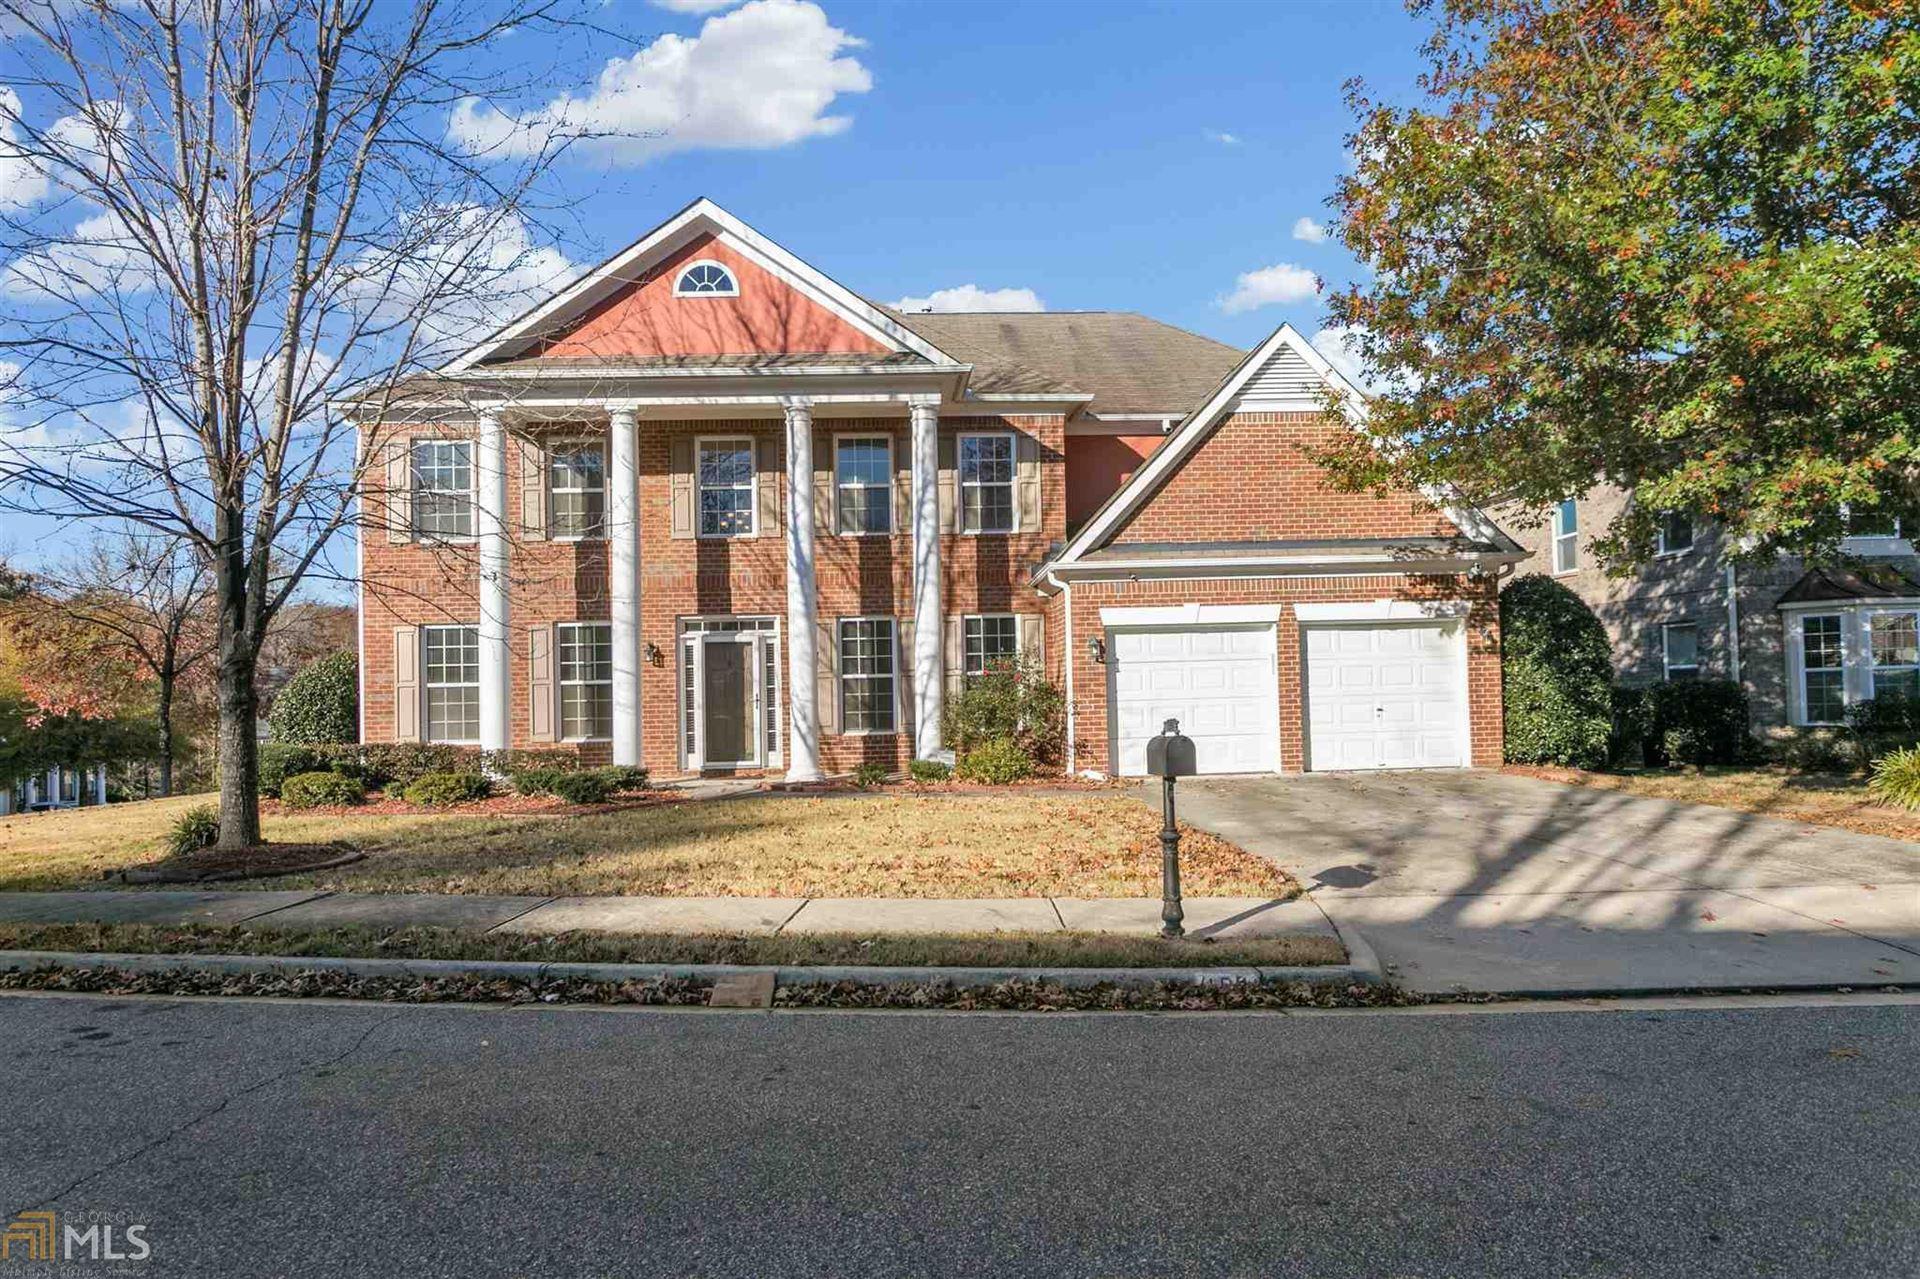 159 Winthrop St, Atlanta, GA 30331 - MLS#: 8886778